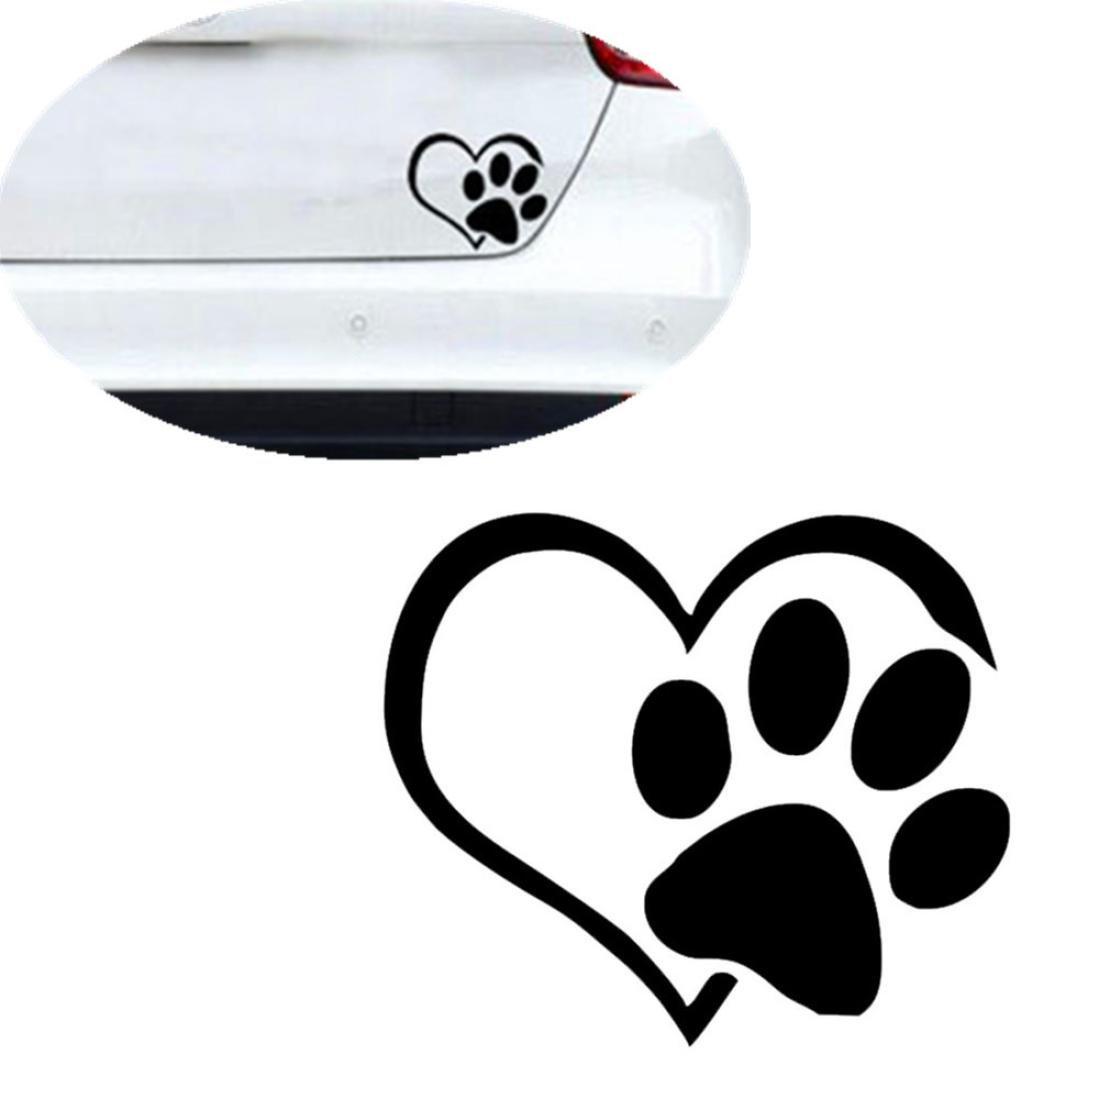 Black Masrin Pet Paw Print with Heart Dog Cat Vinyl Decal Car Window Bumper Sticker